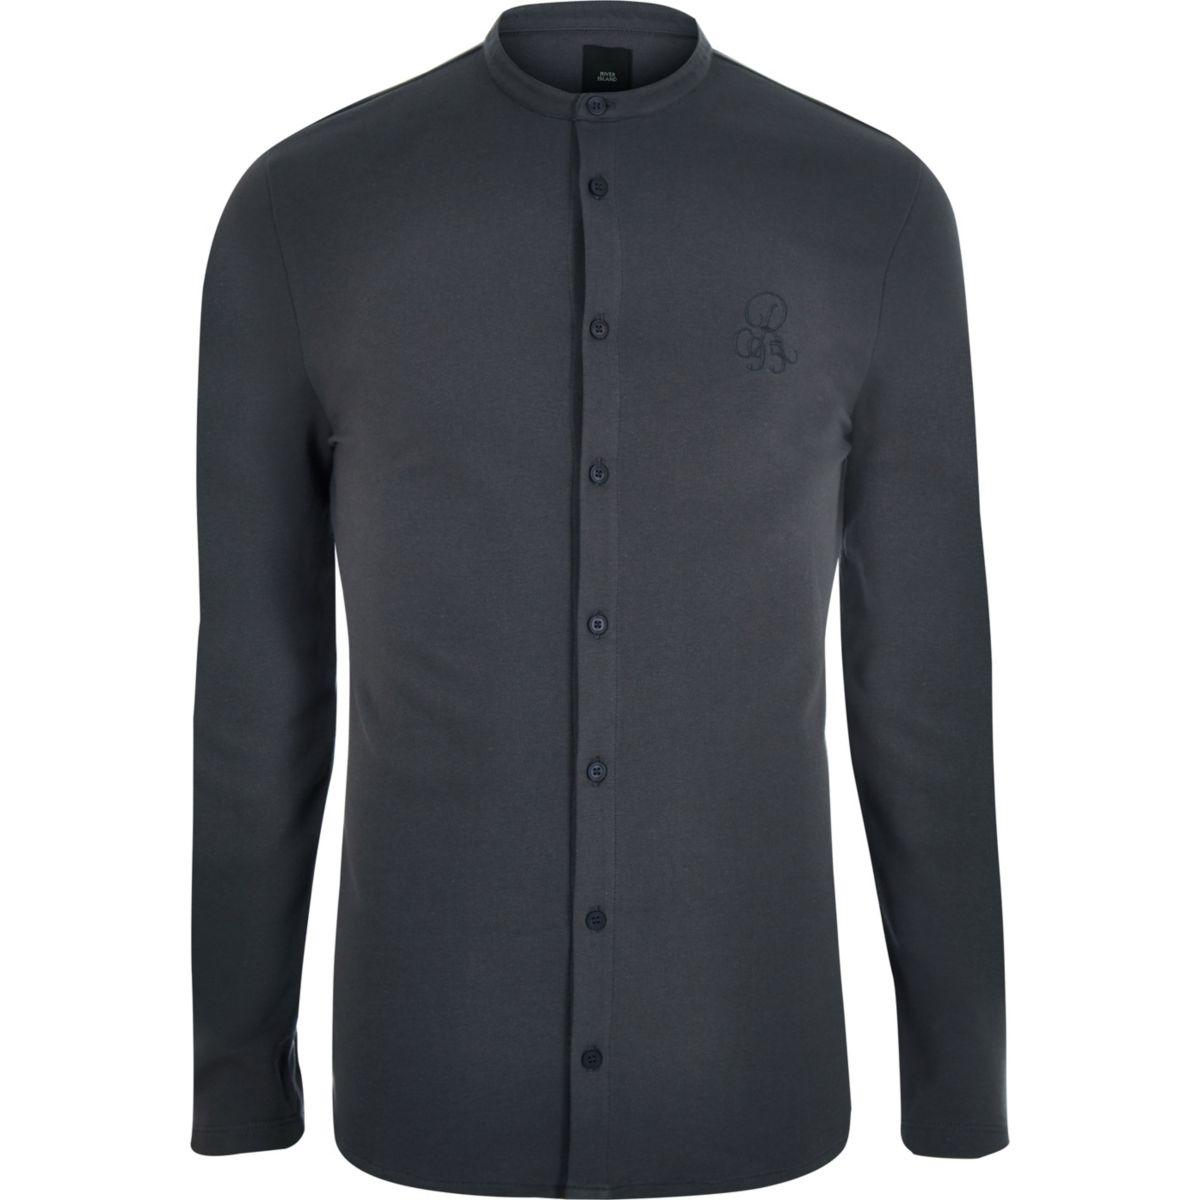 Dark grey pique muscle fit grandad shirt